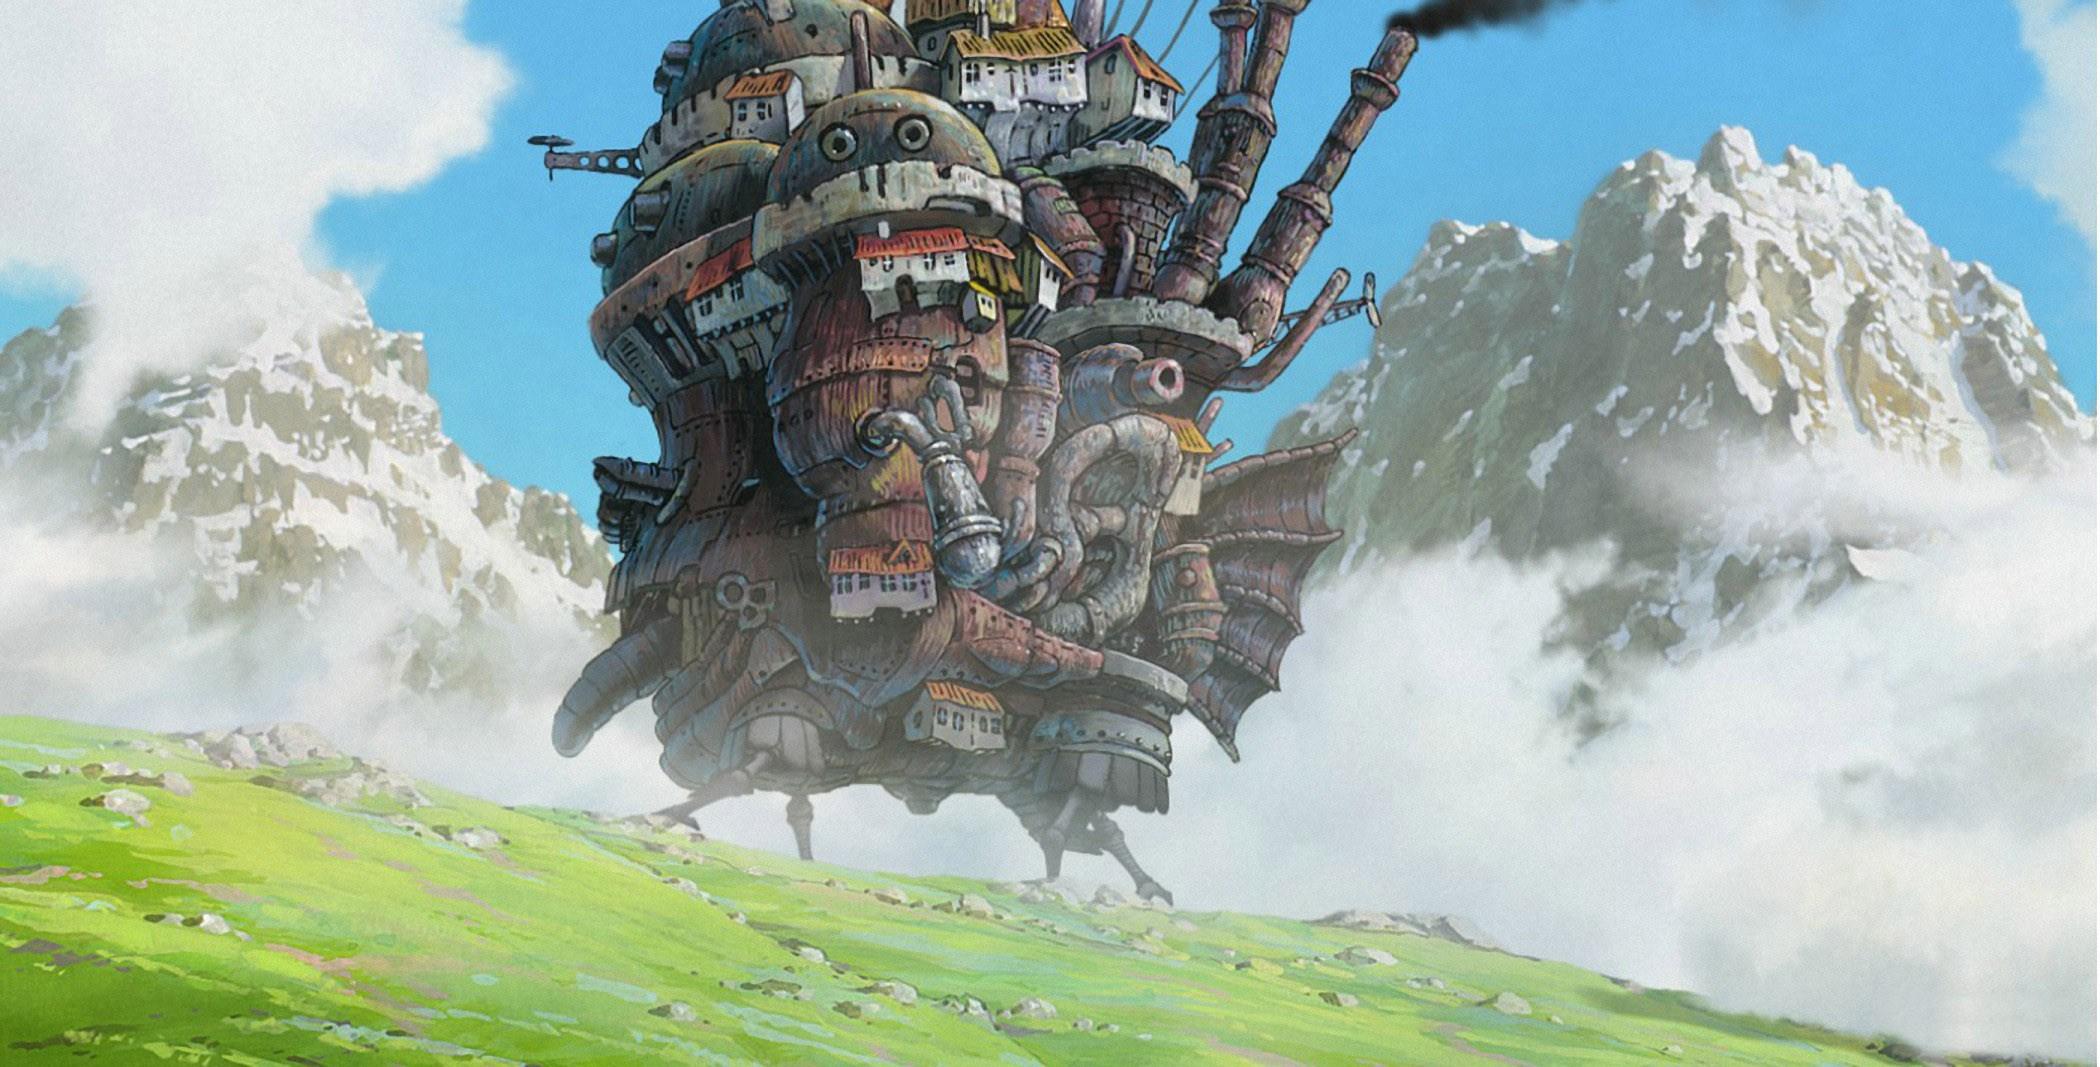 El castillo ambulante Miyazaki cine familiar infantil Modiband